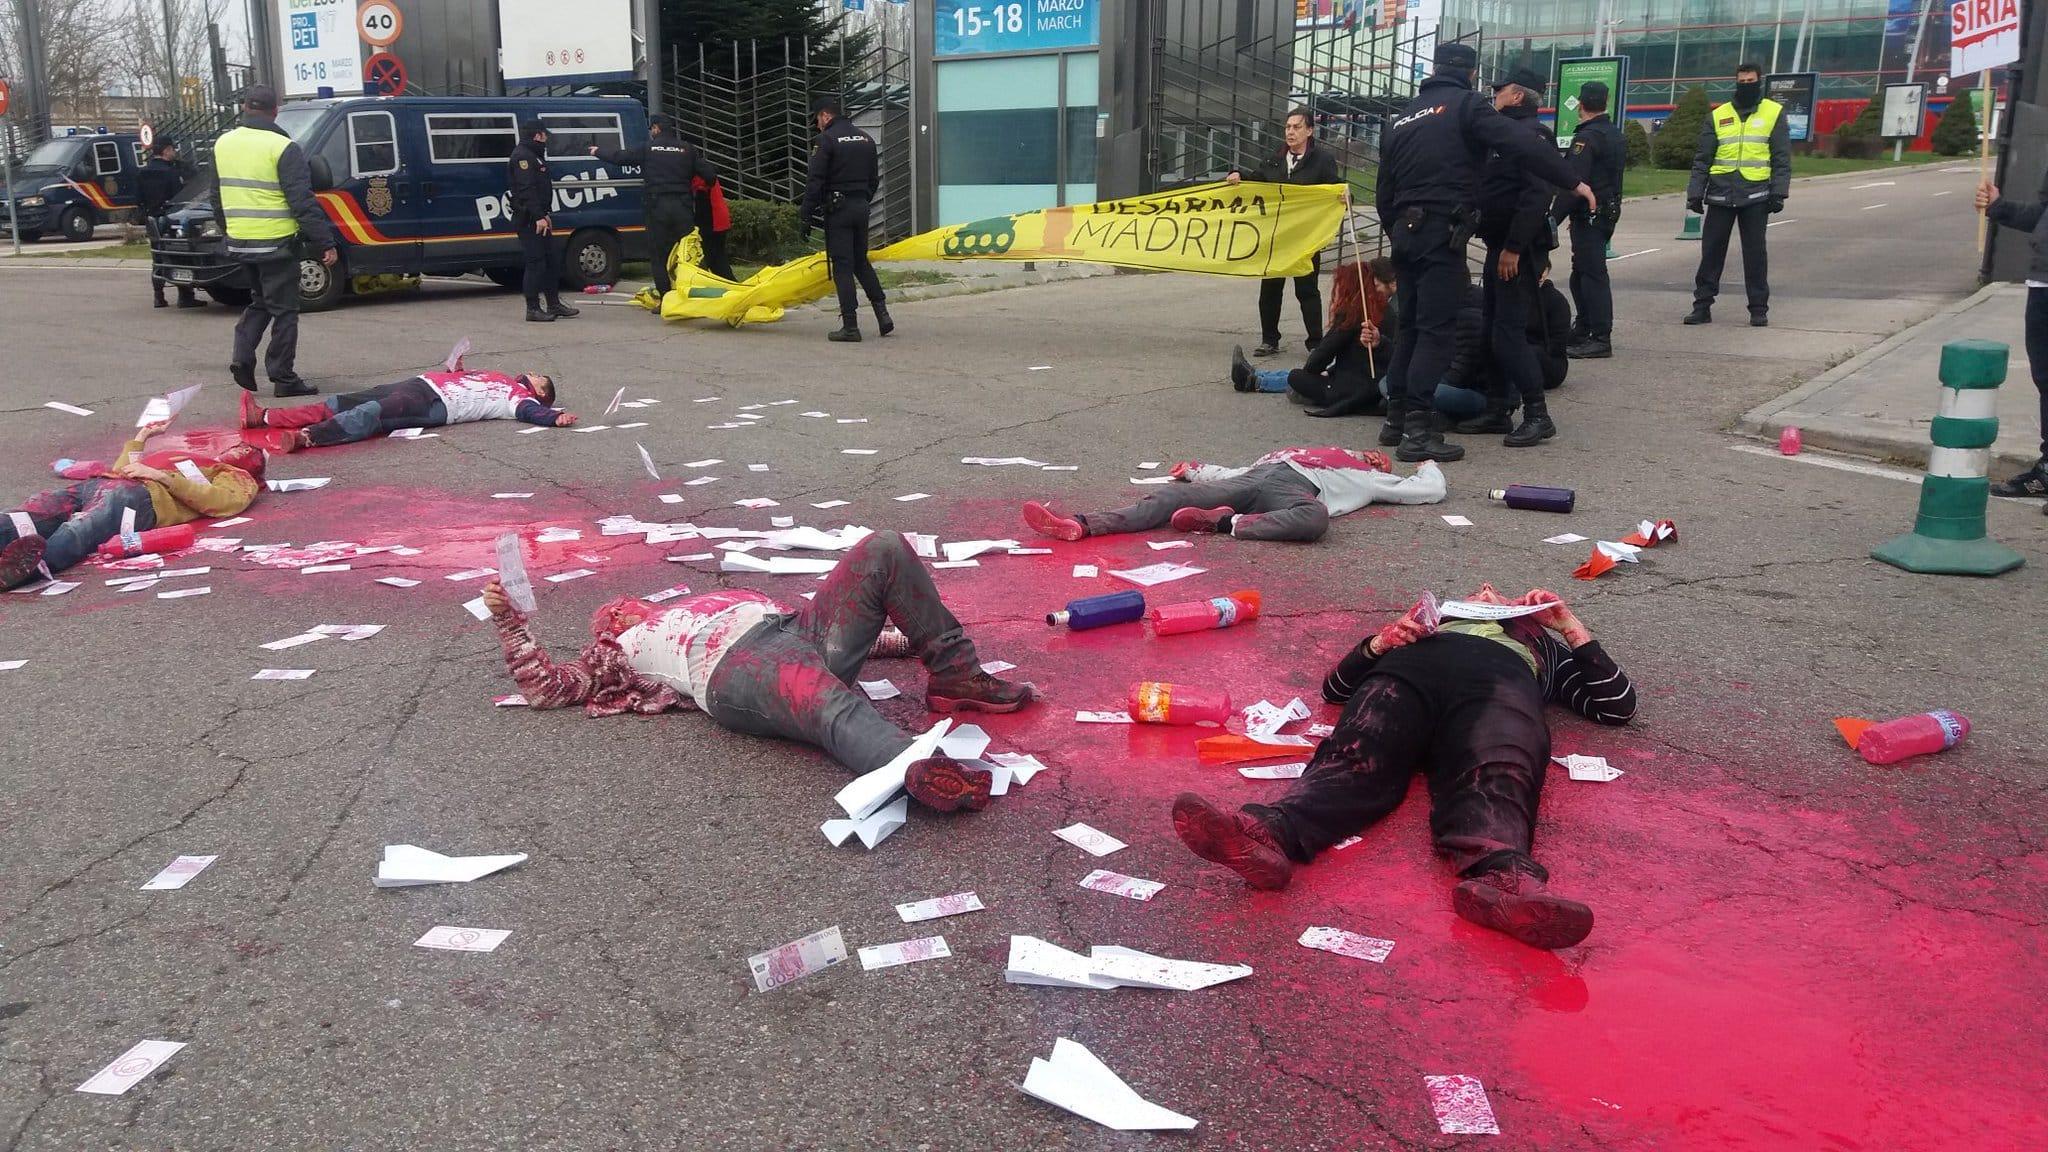 Protesta del colectivo Desarma Madrid. I La Marea